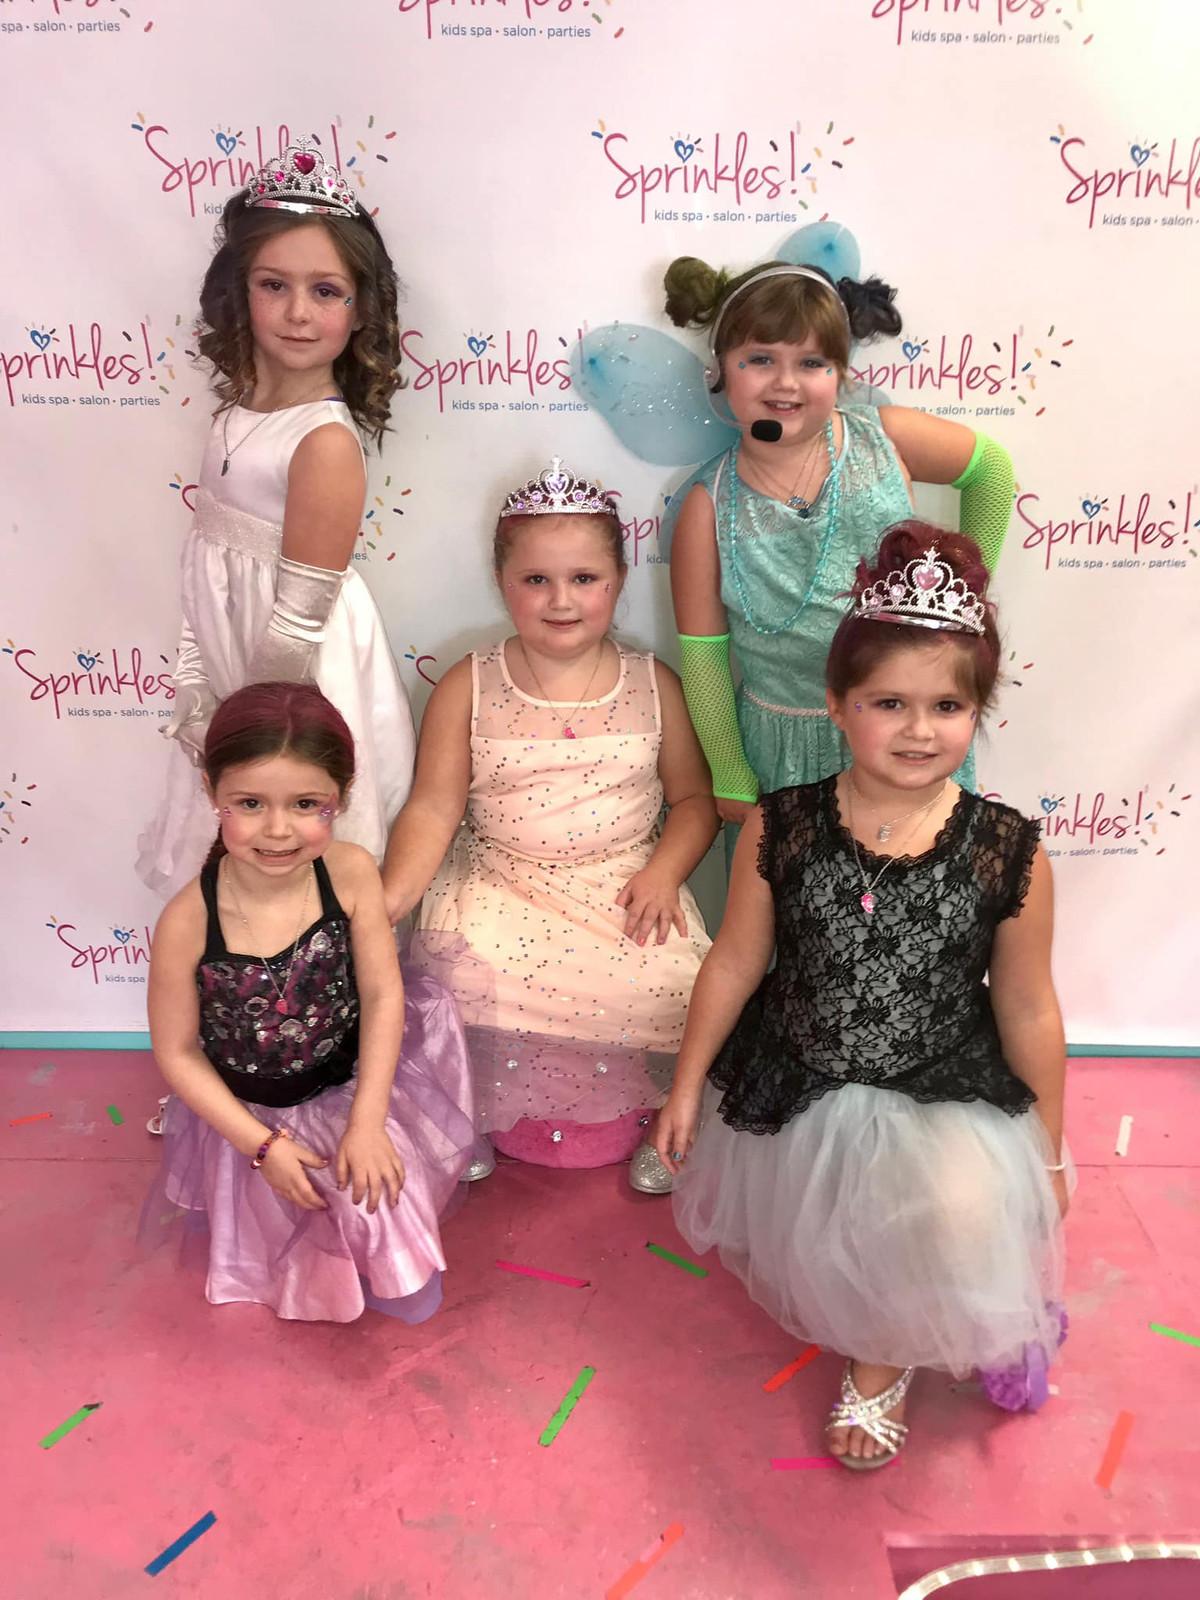 20a130481 1 Fun Kids Spa, Salon and Parties- Sprinkles Kids Spa / Albany, NY